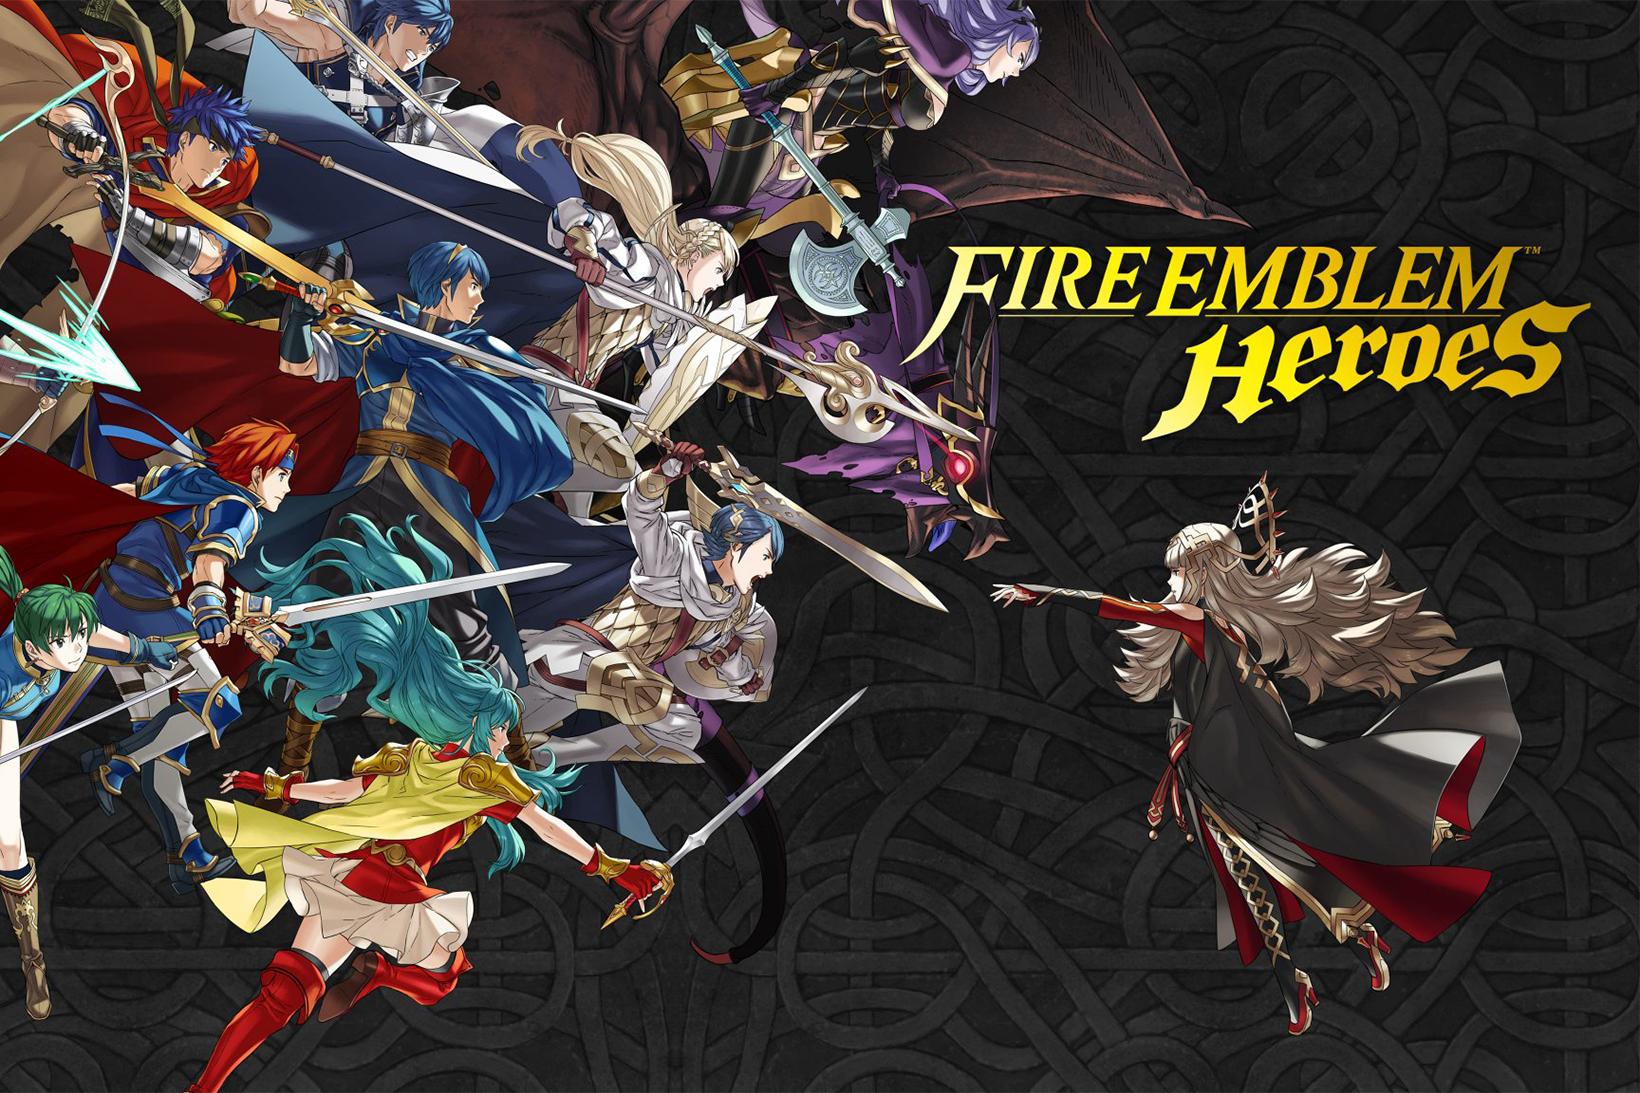 Fire Emblem Heroes recauda millones de dólares para Nintendo